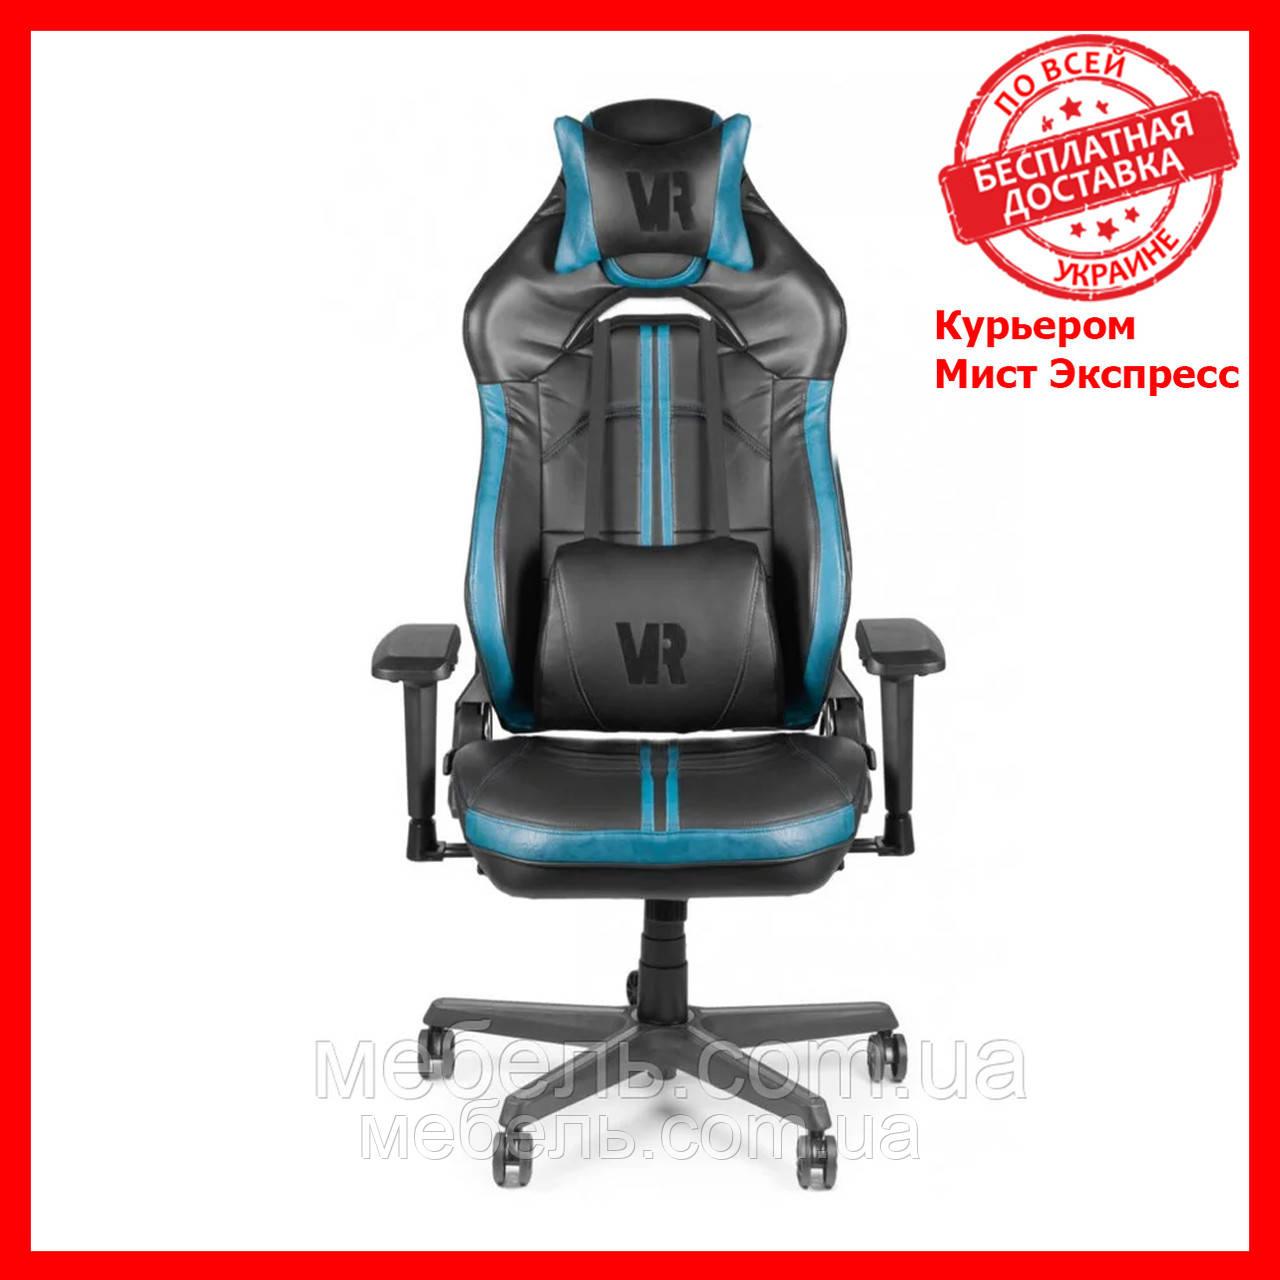 Кресло для врача Barsky CYB-02 VR Cyberpunk Blue, черный / синий